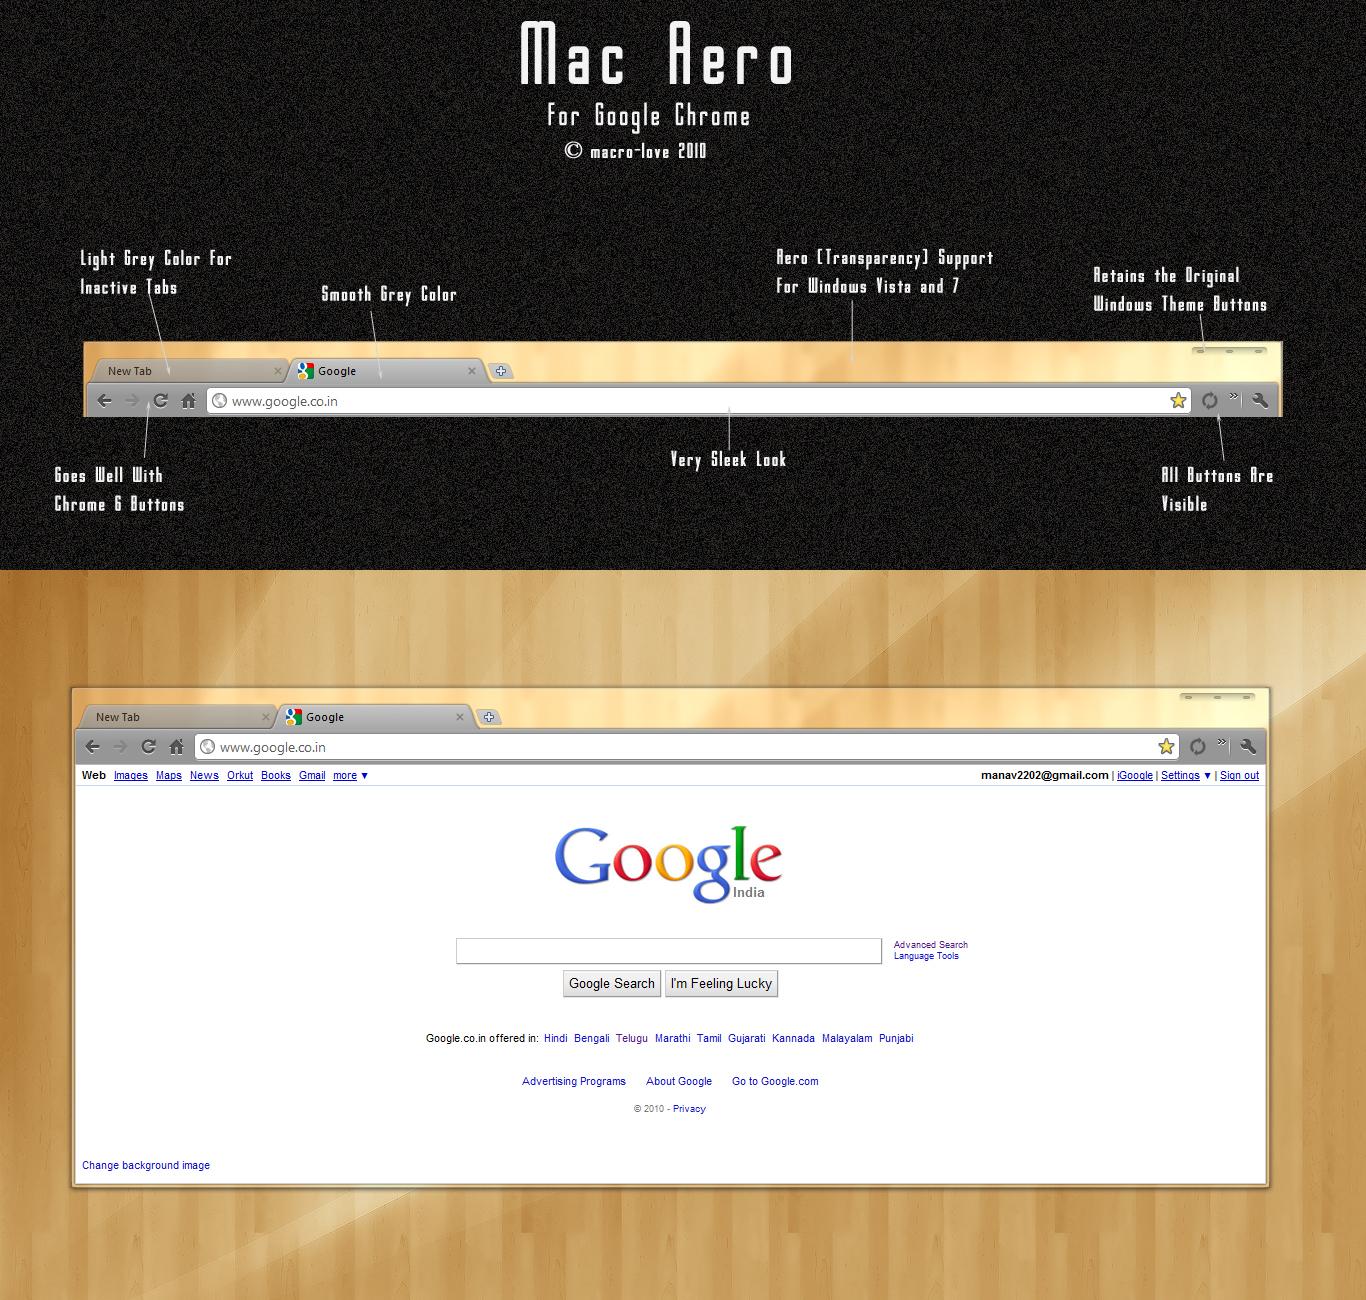 Mac Aero For Google Chrome by mACrO-lOvE on DeviantArt